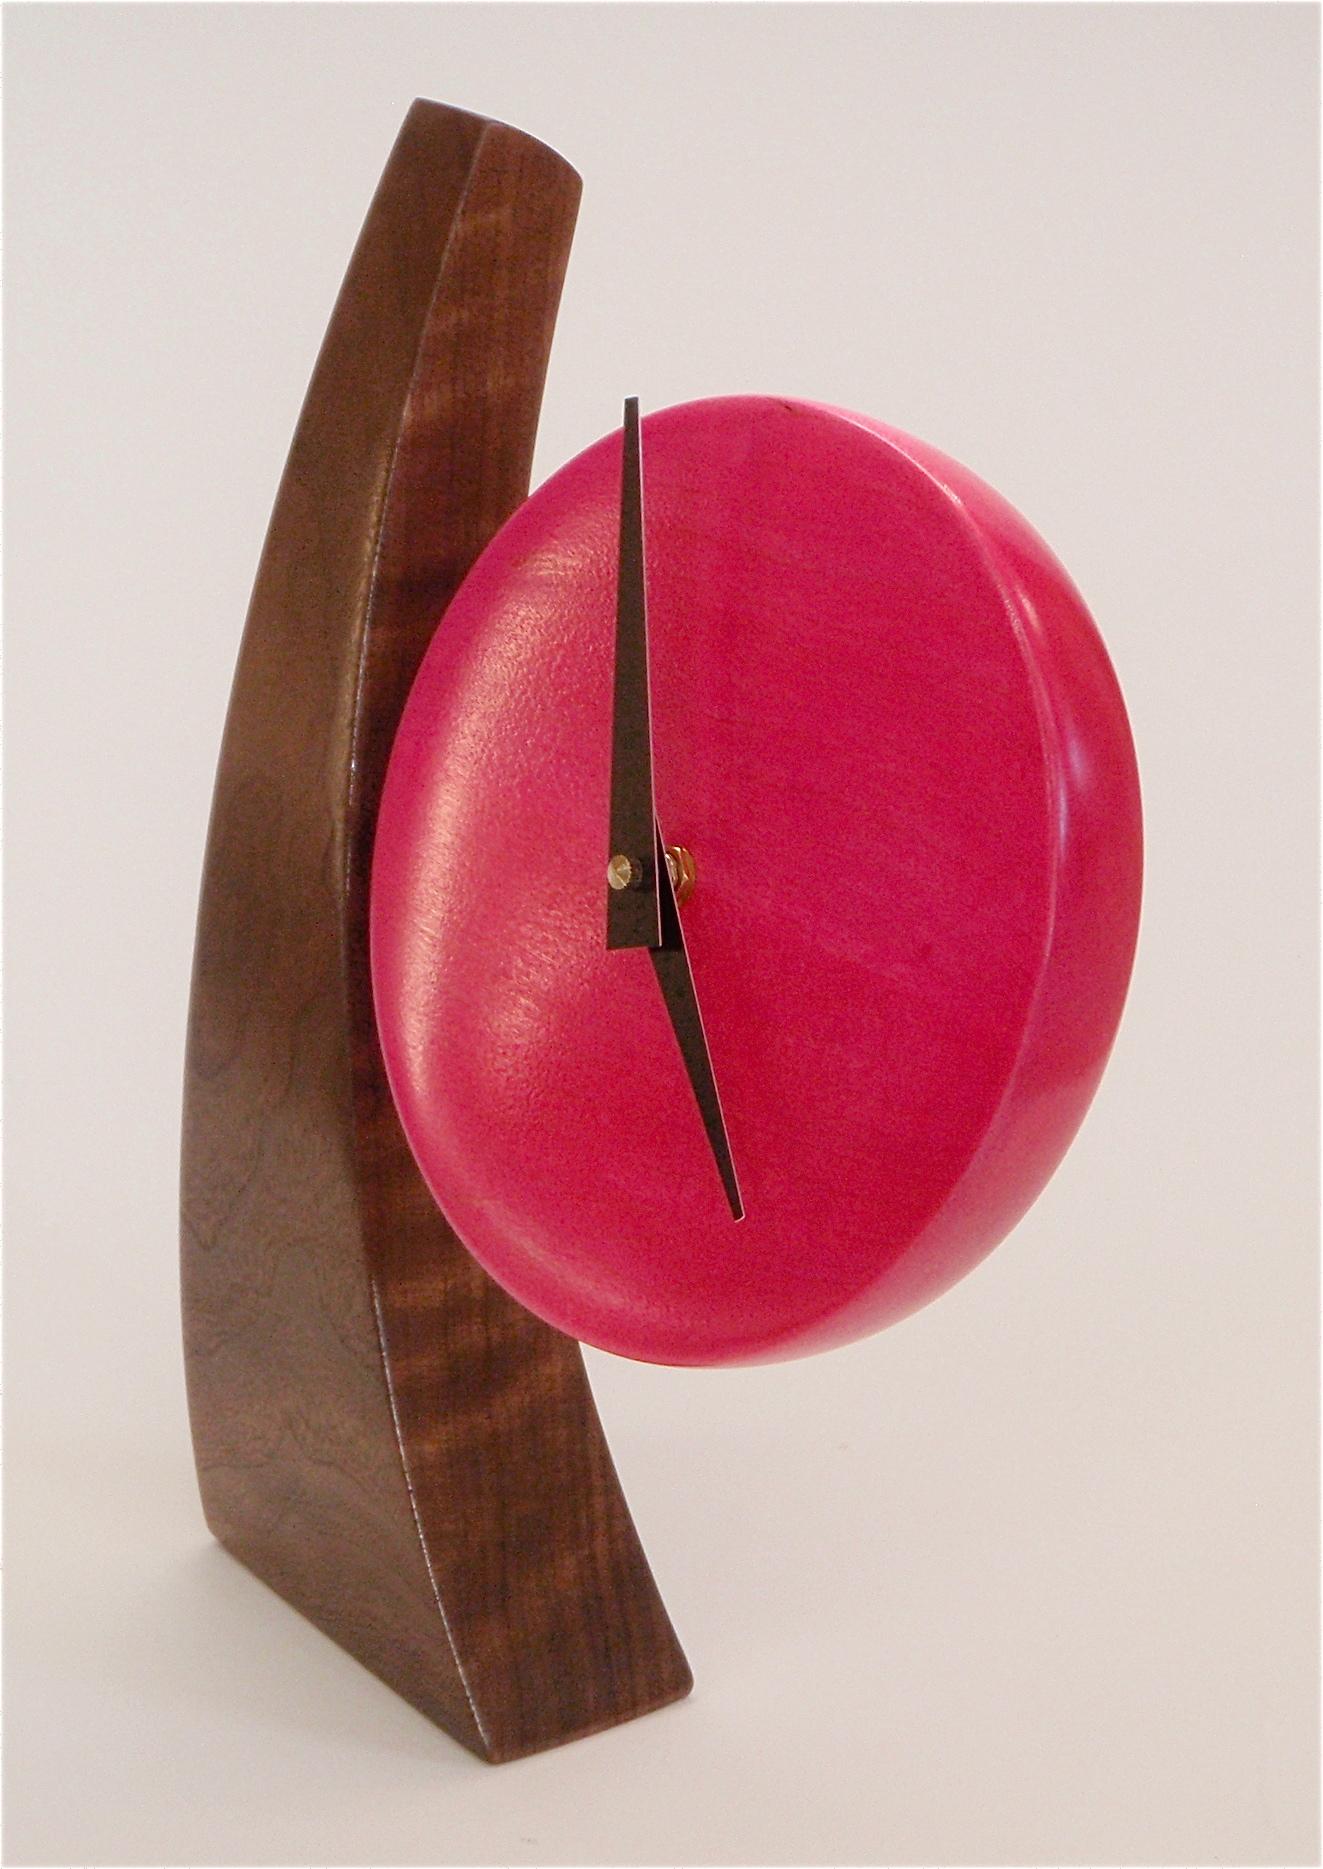 Adjustable desk clock 03